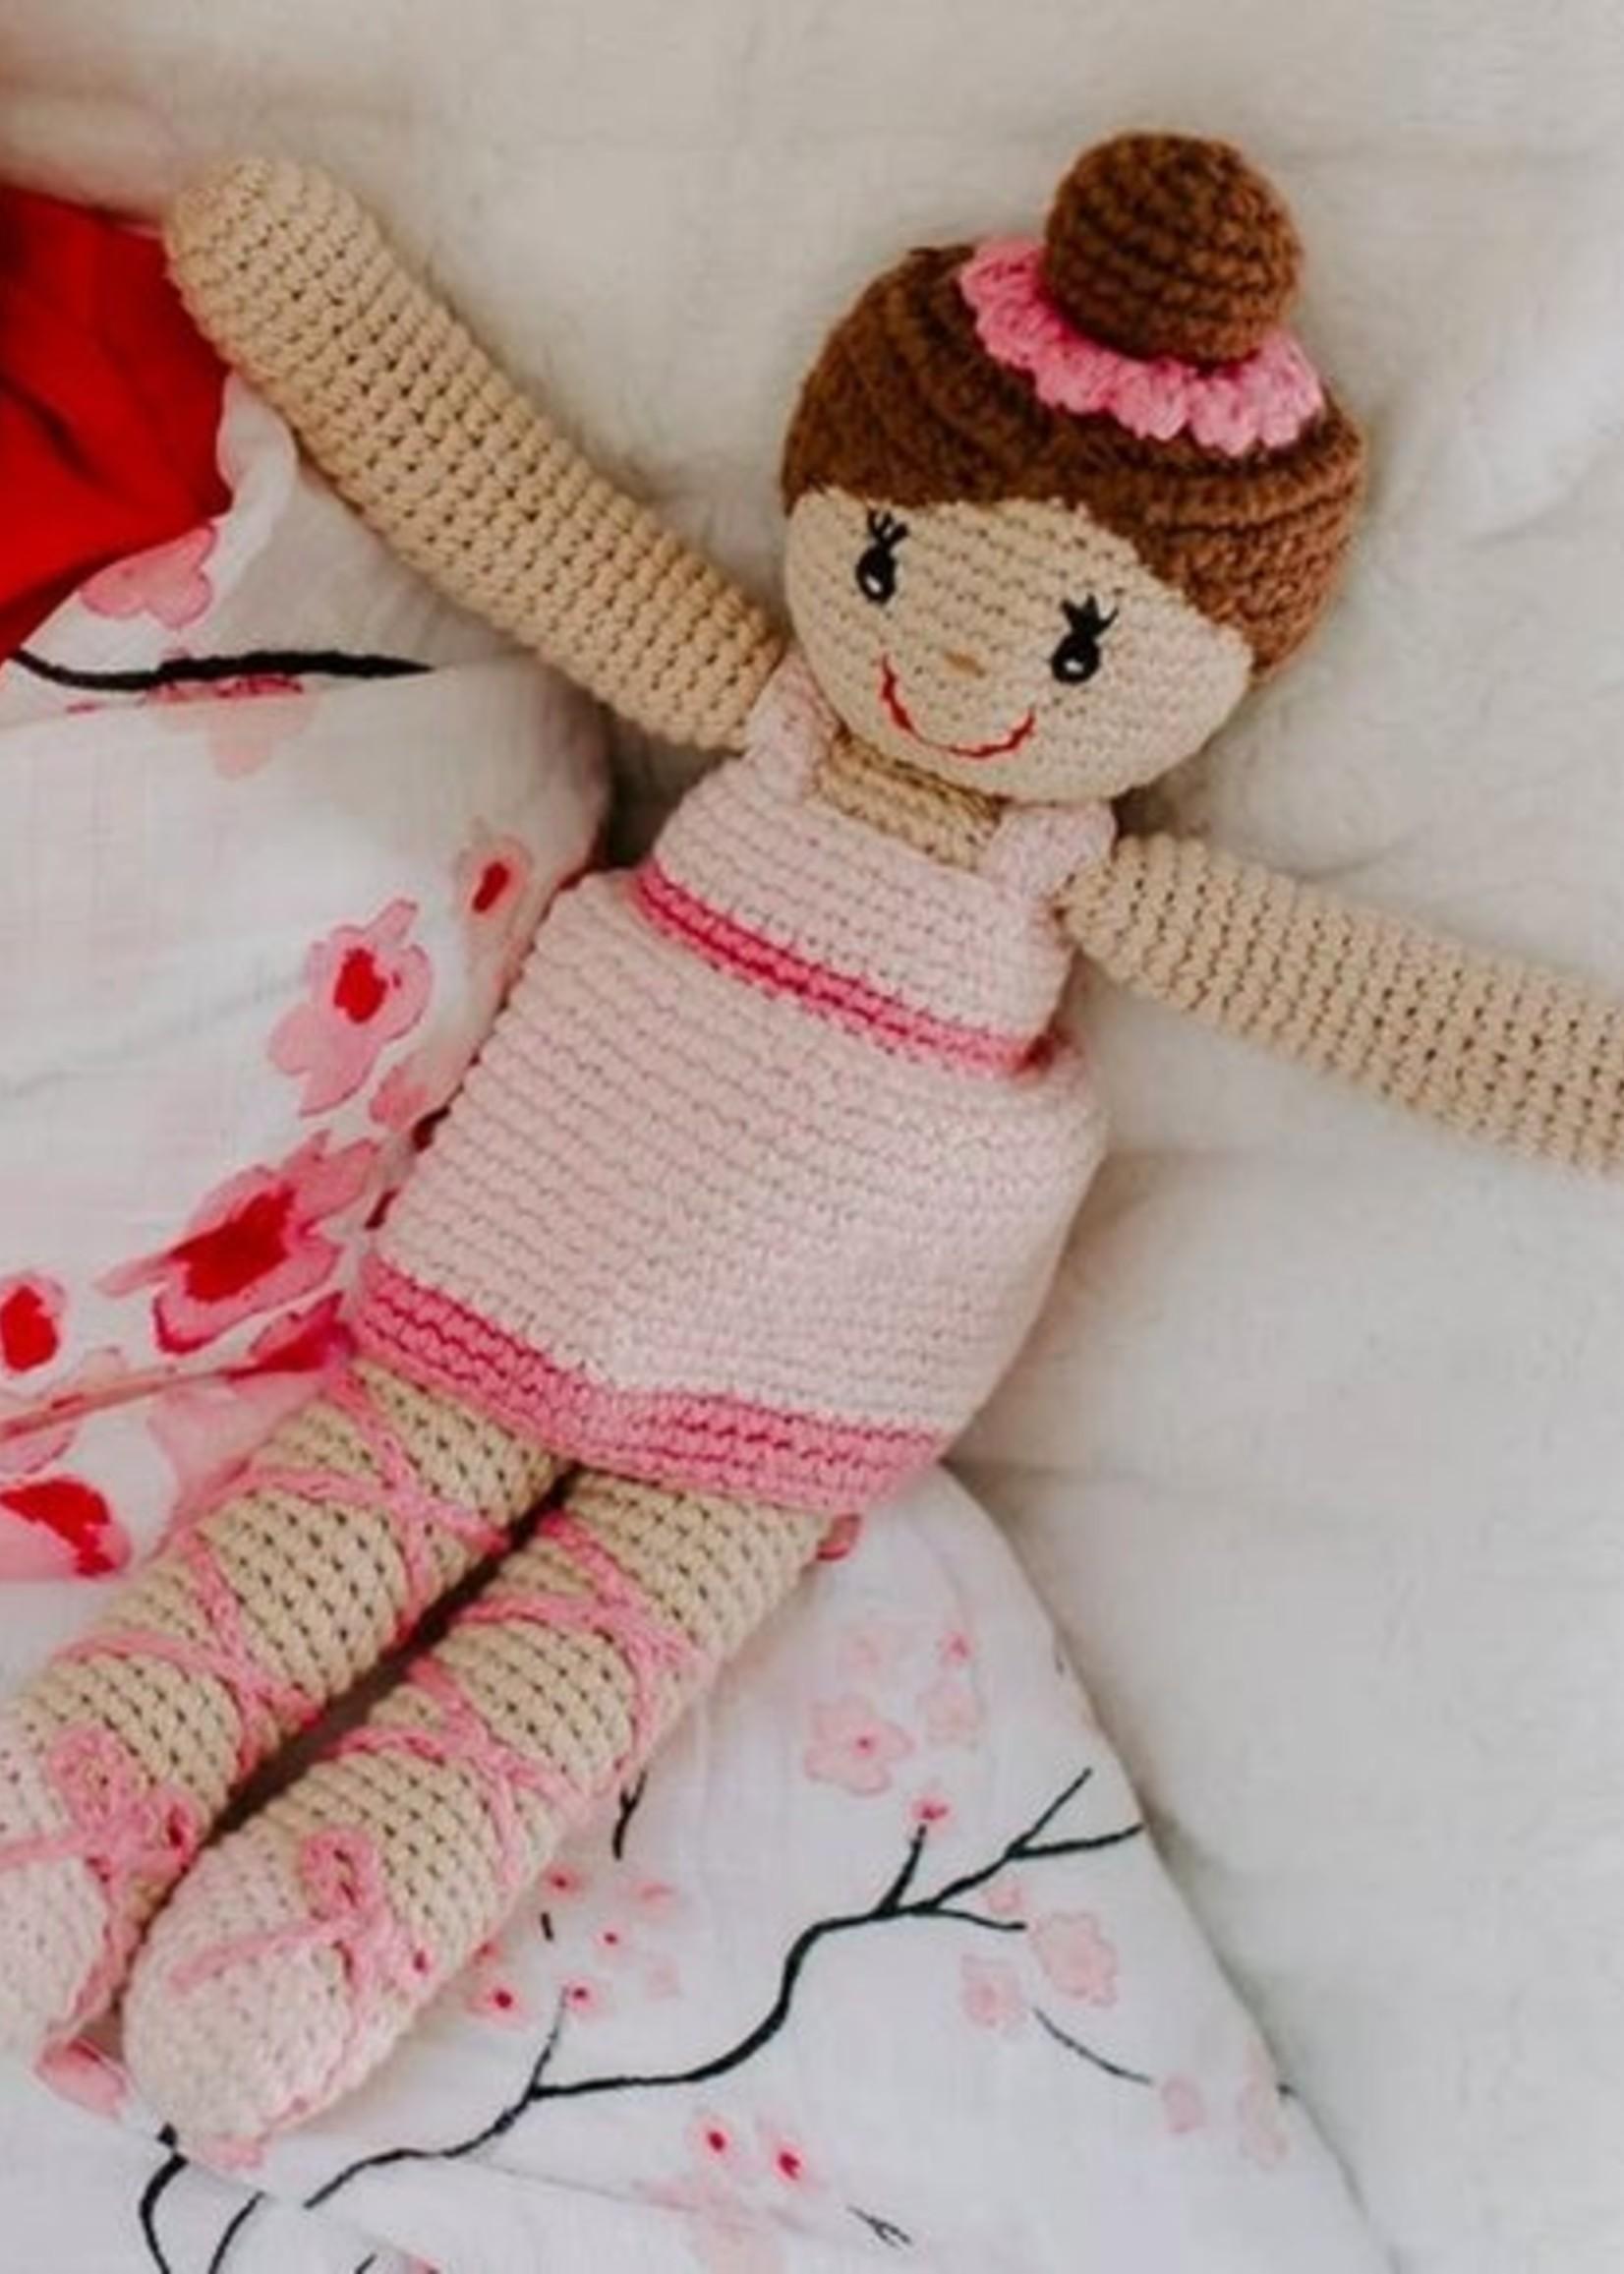 pebble Handmade Ballerina